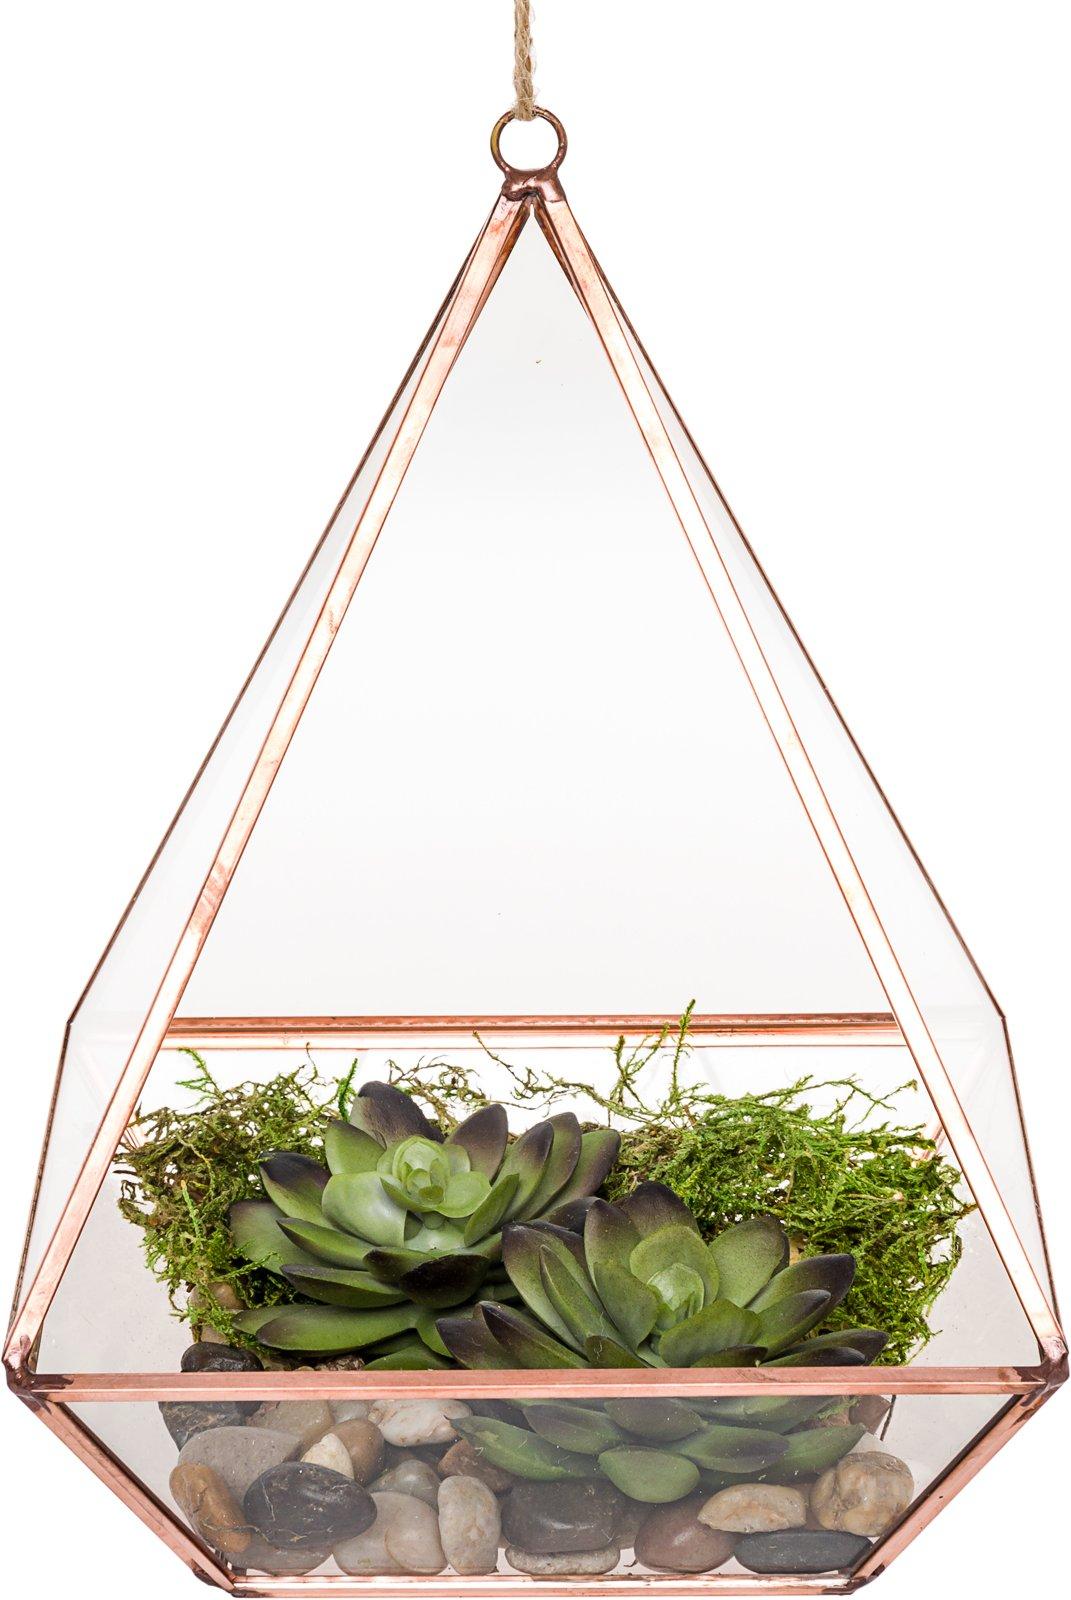 Mindful Design Glass Terrarium - Geometric Diamond Desktop Garden Planter by (Rose Gold) by Mindful Design